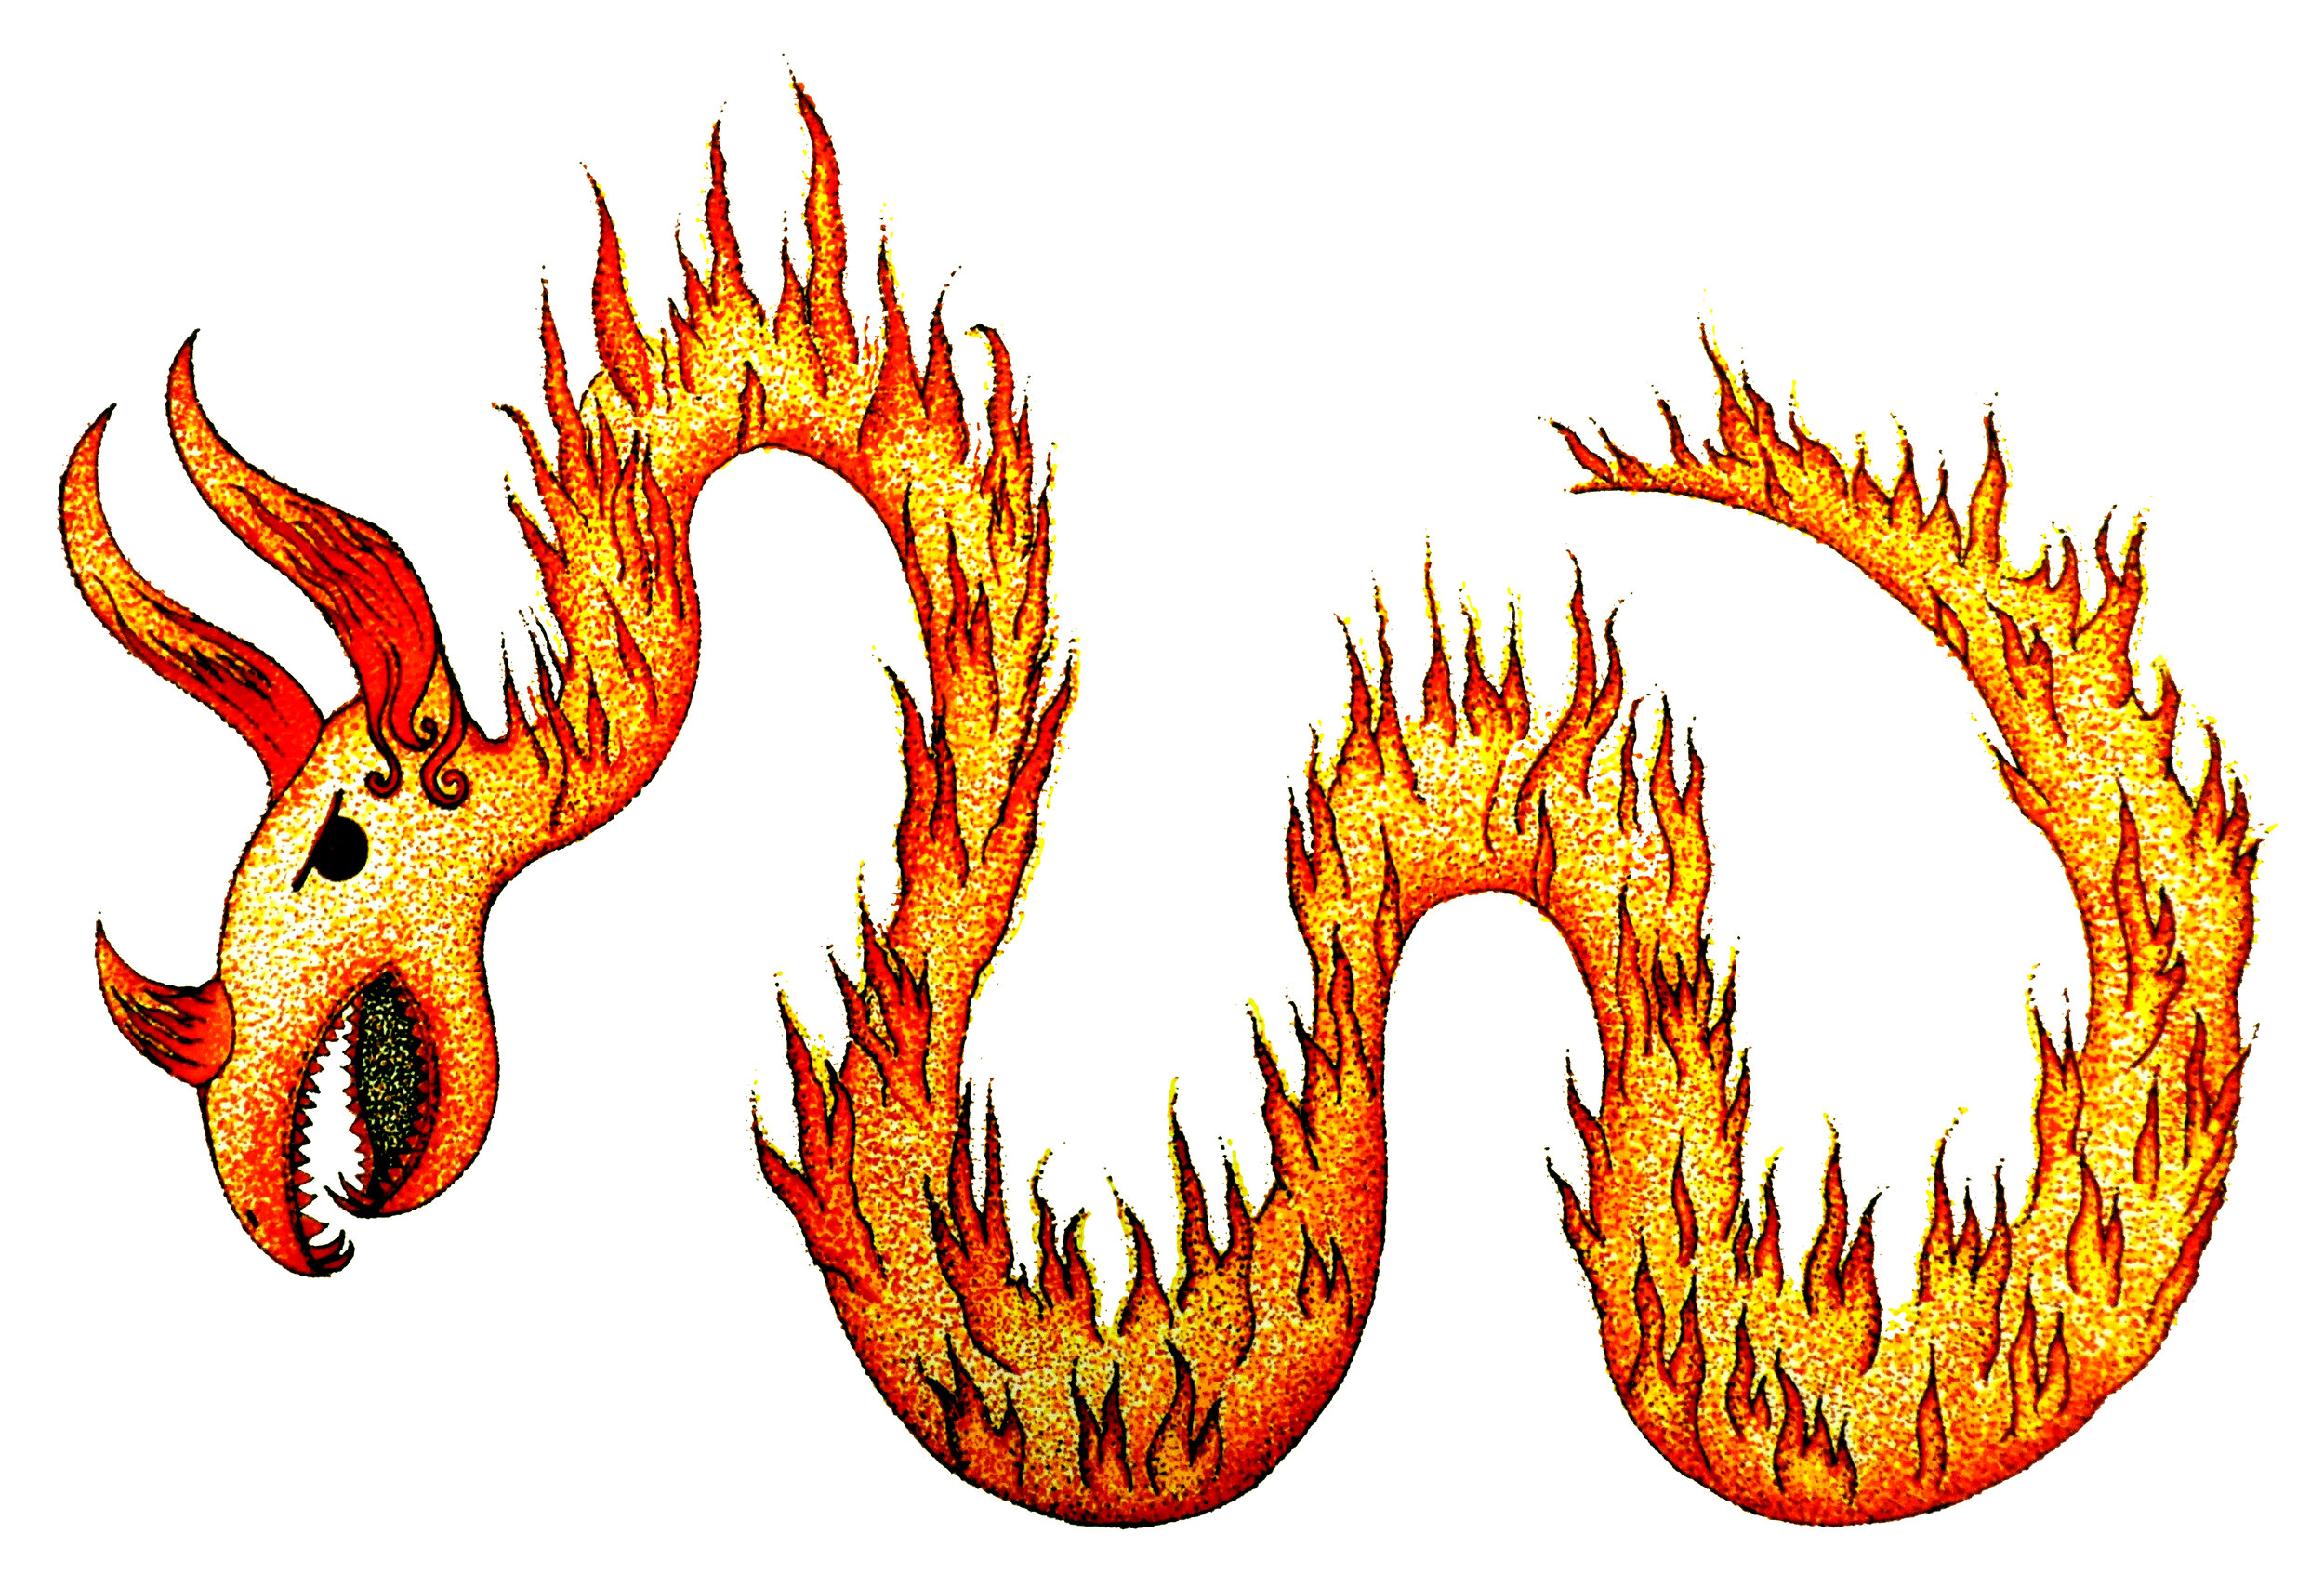 fireworm 9edited.jpg